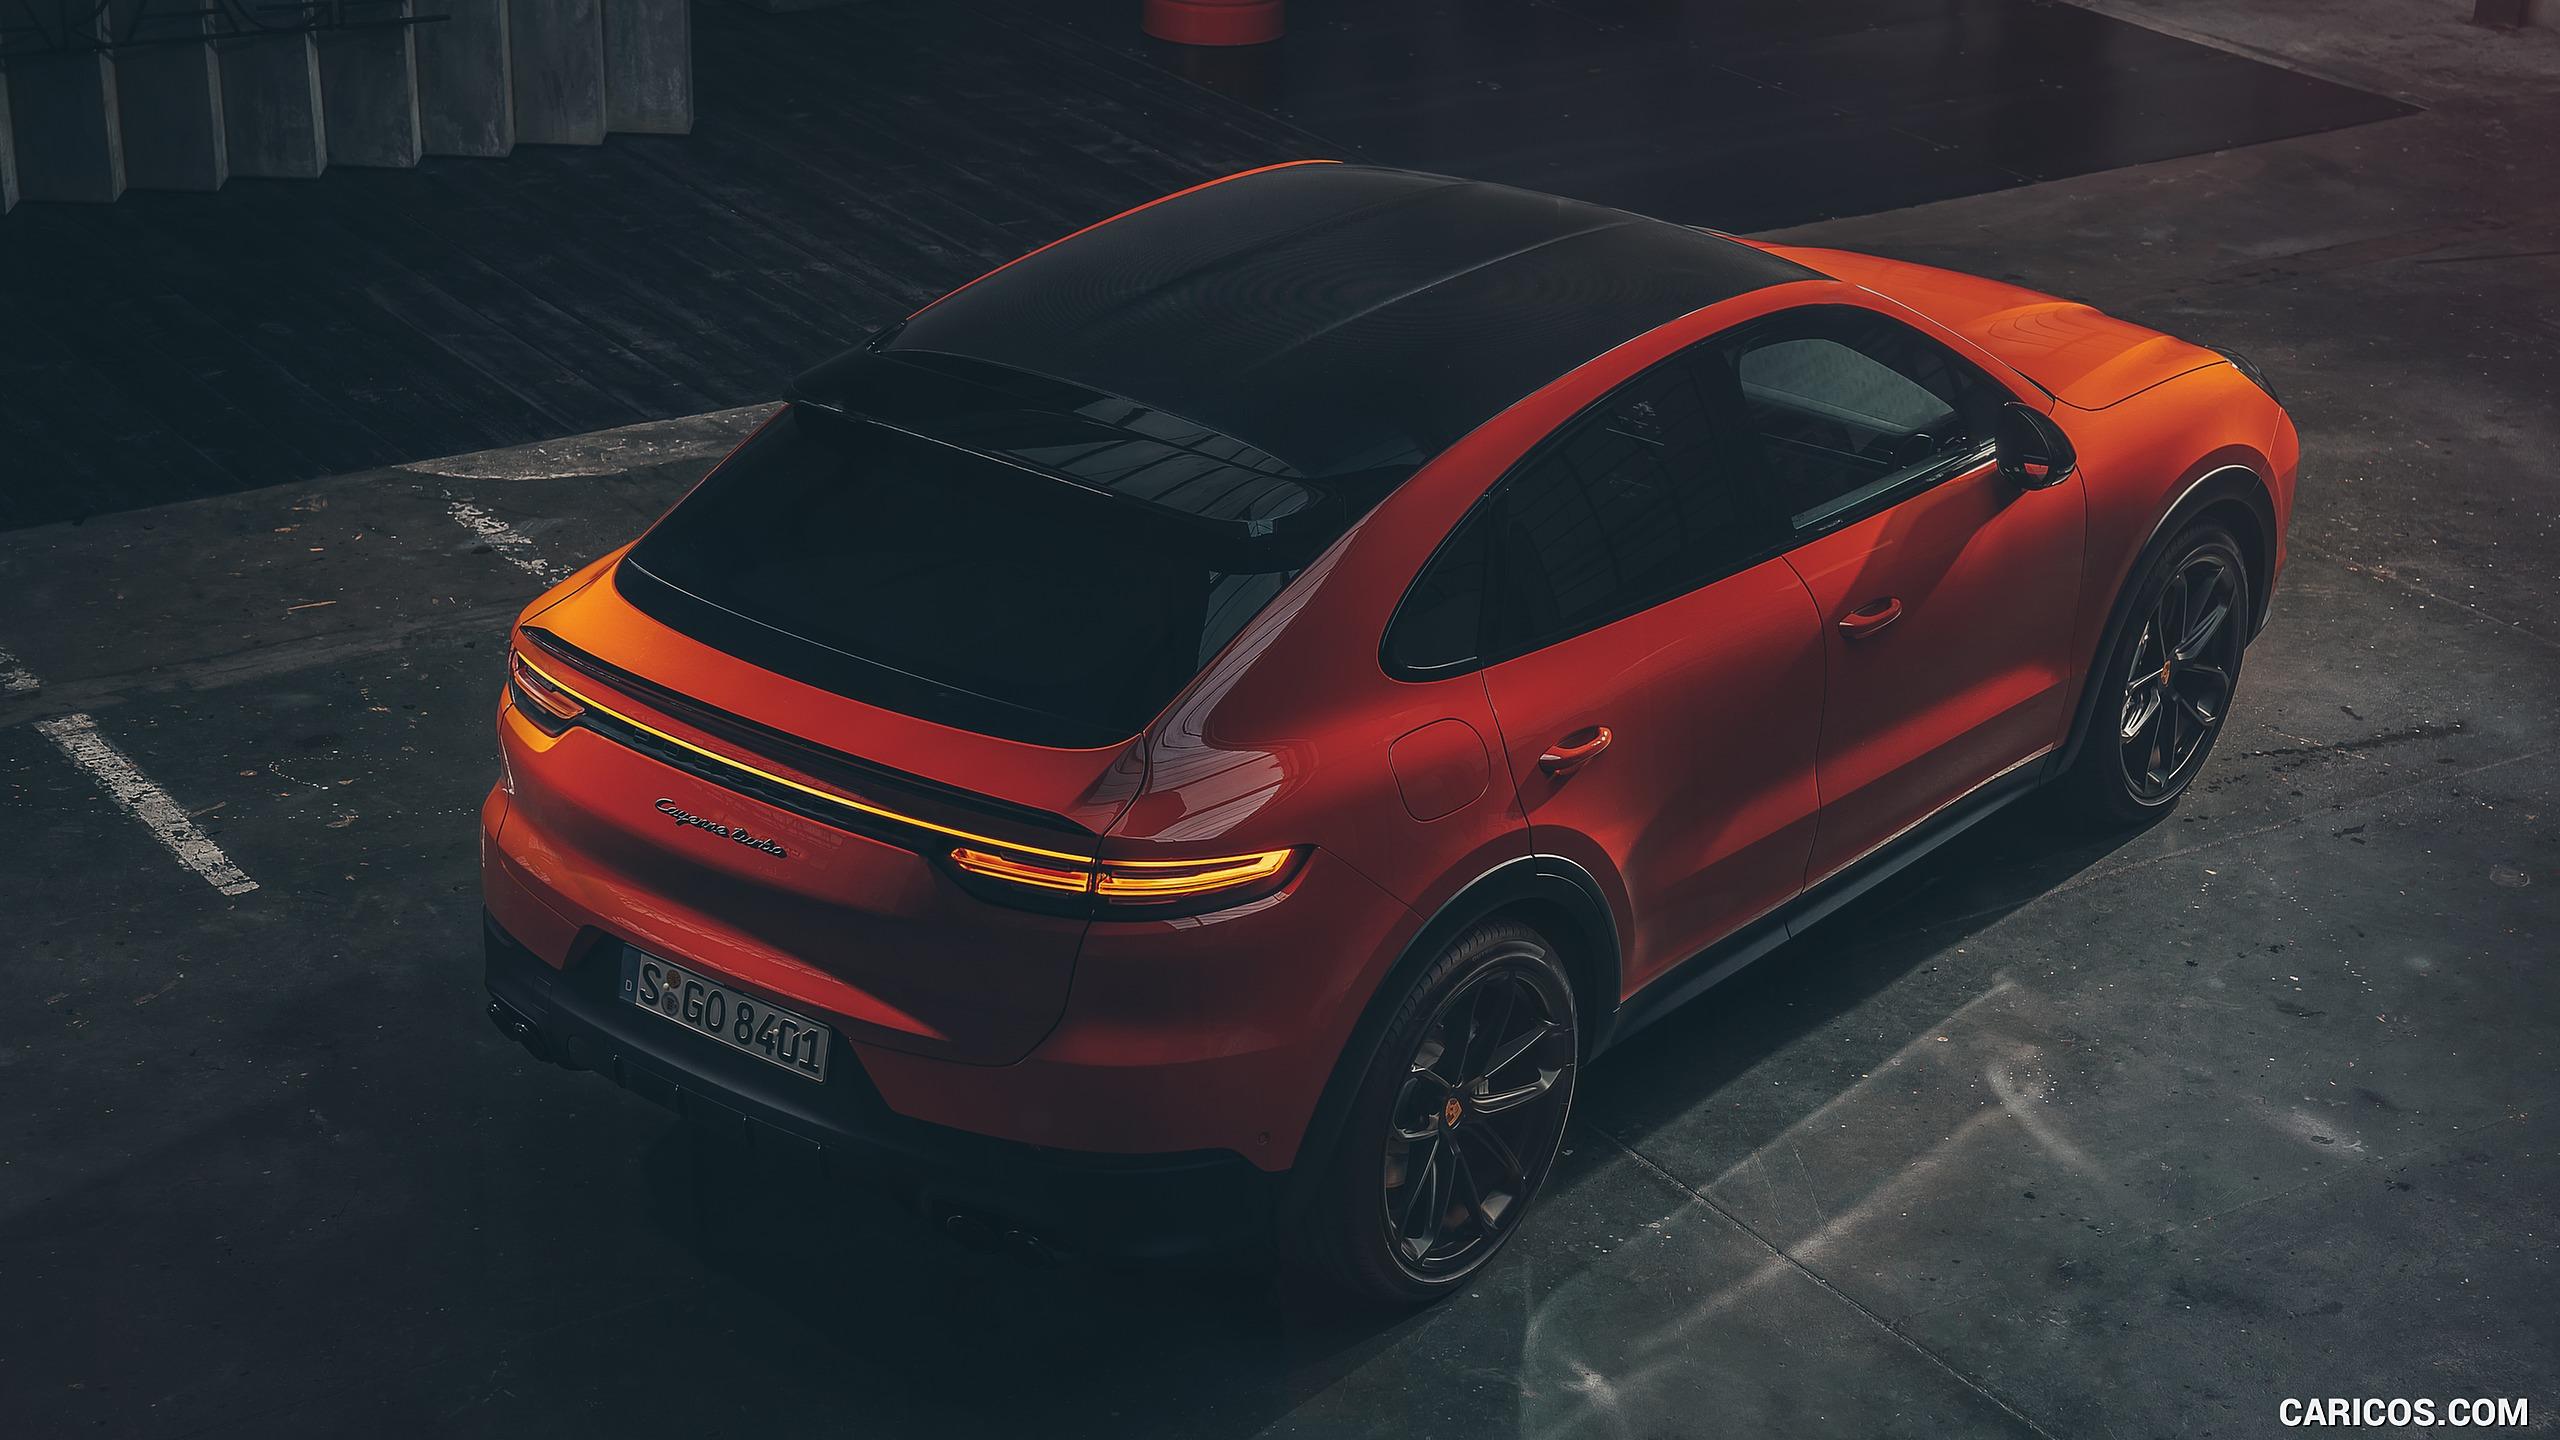 2020 Porsche Cayenne Coupe   Top HD Wallpaper 23 2560x1440